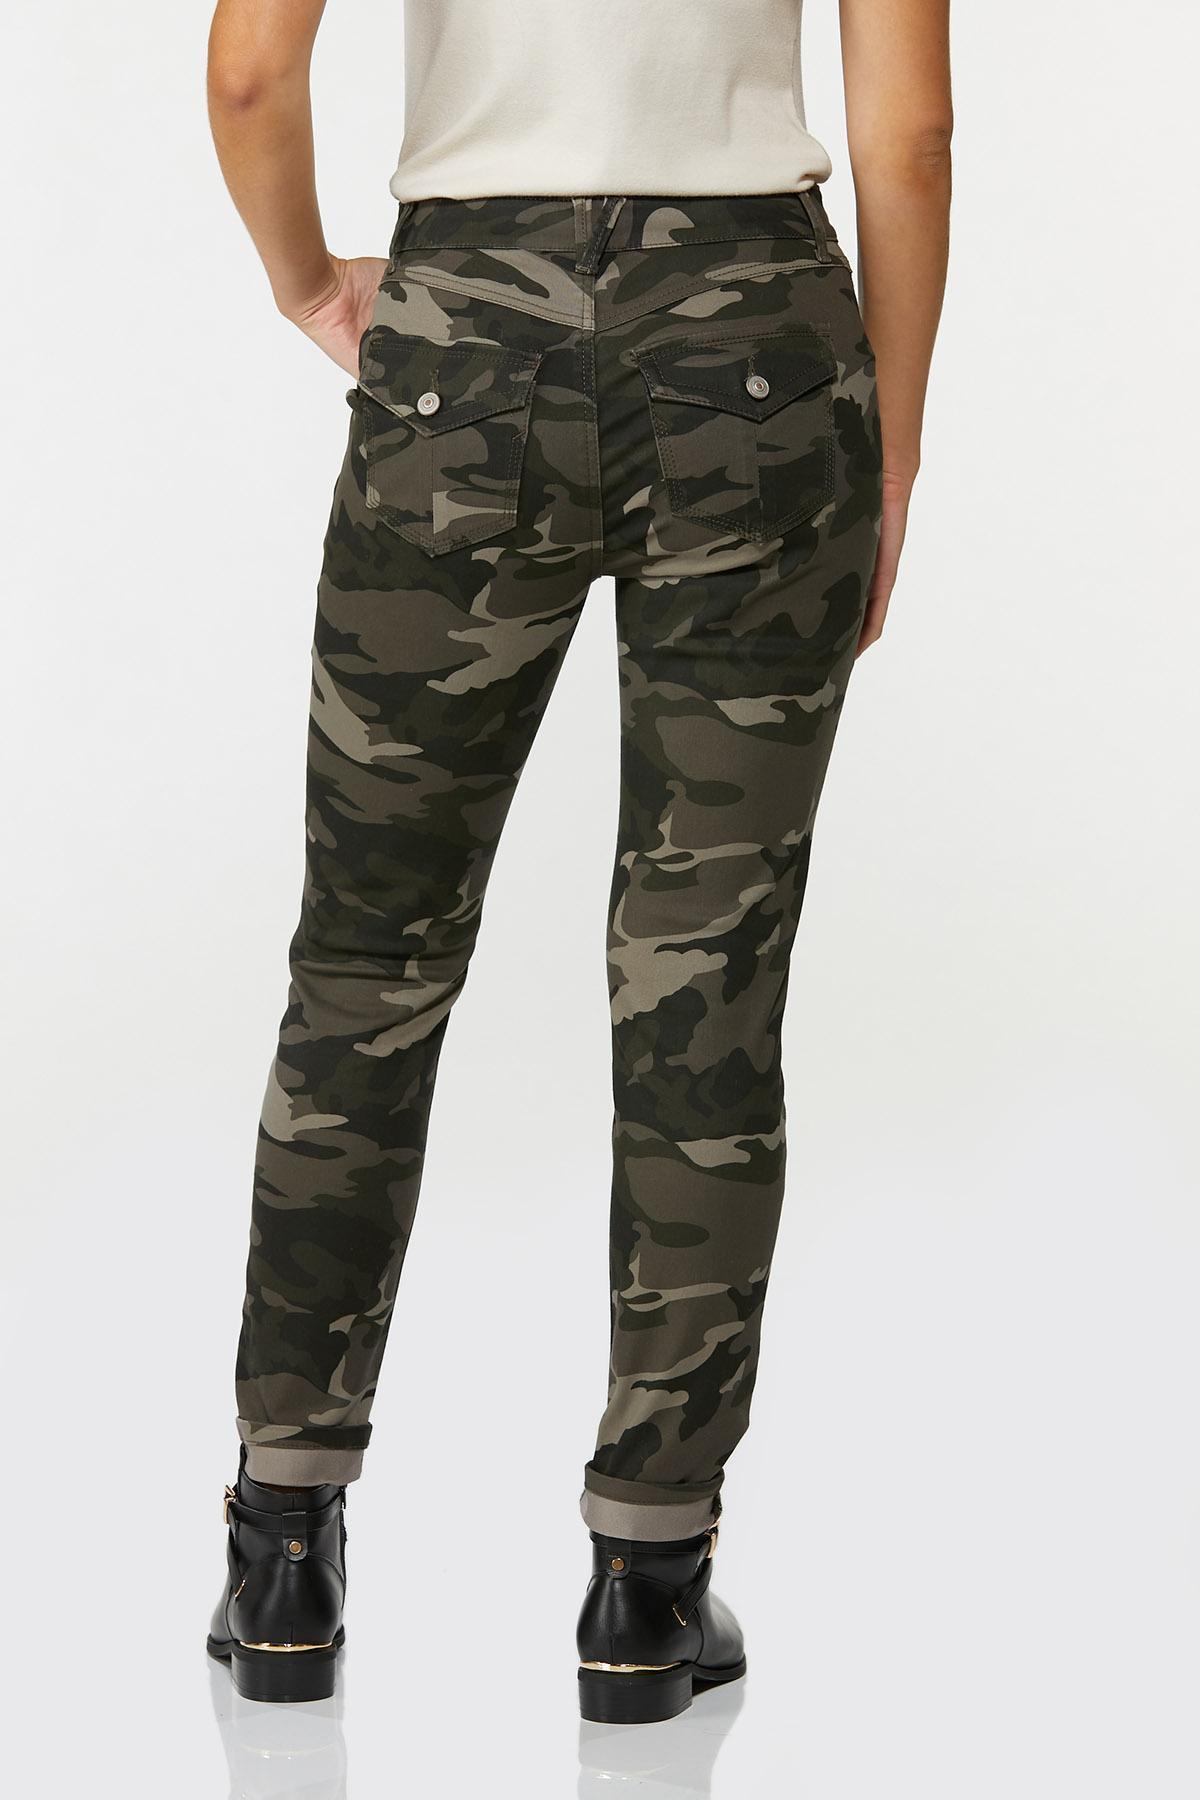 Camo Utility Pants (Item #44699756)